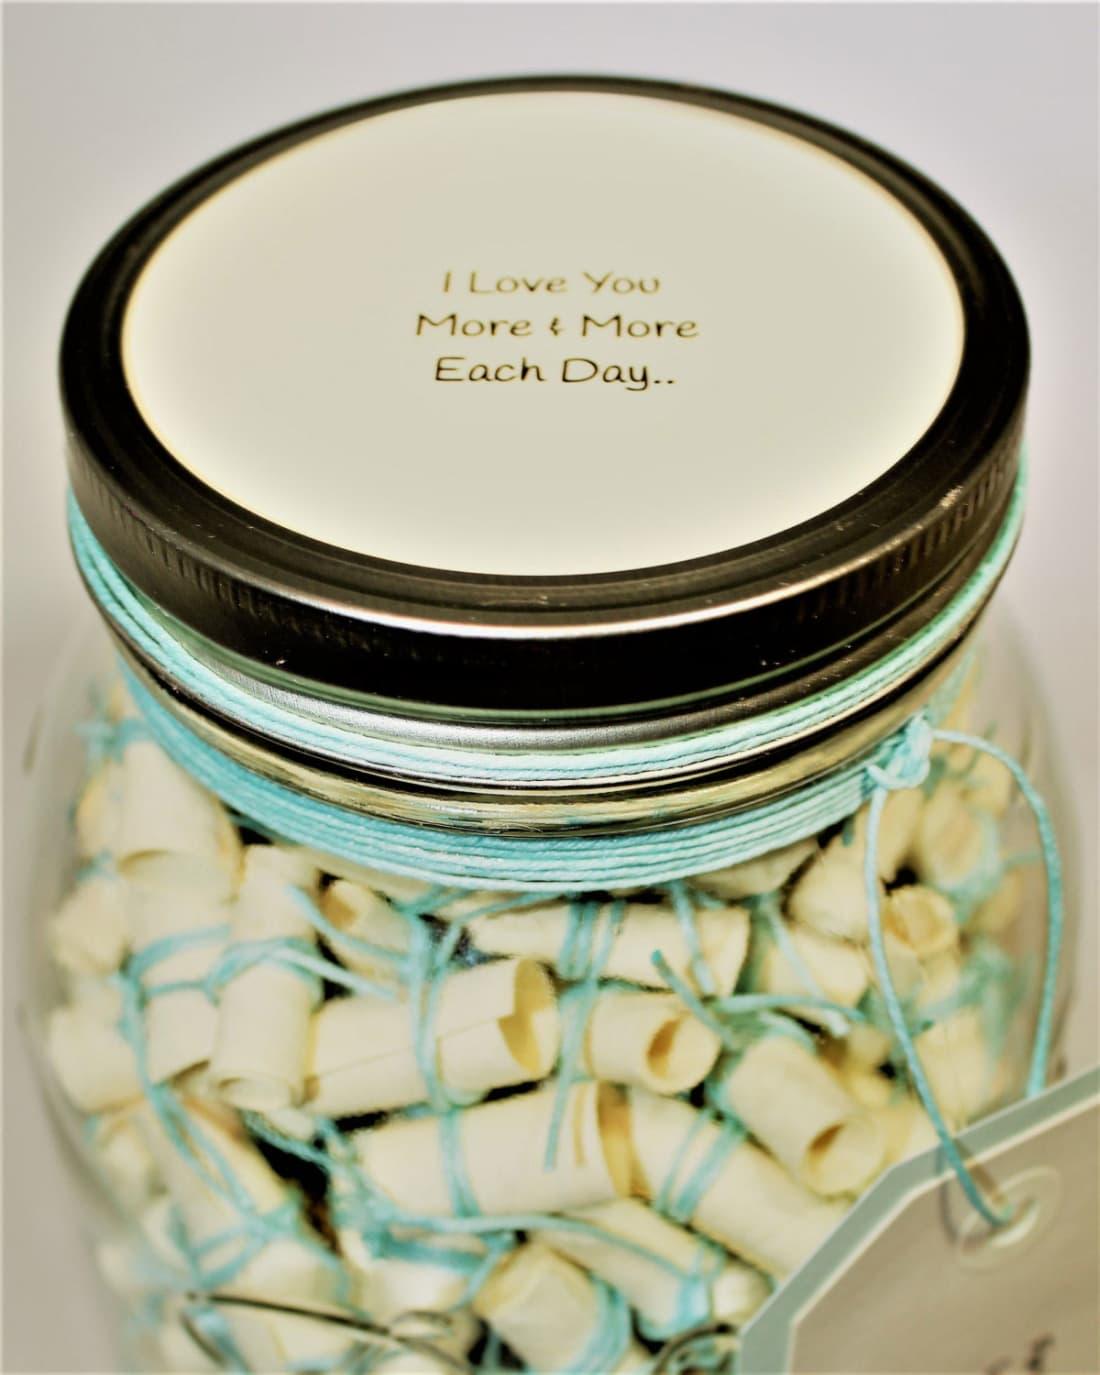 Days Of Happiness In A Jar Longevity - Boyfriend puts 365 love notes jar girlfriend read year